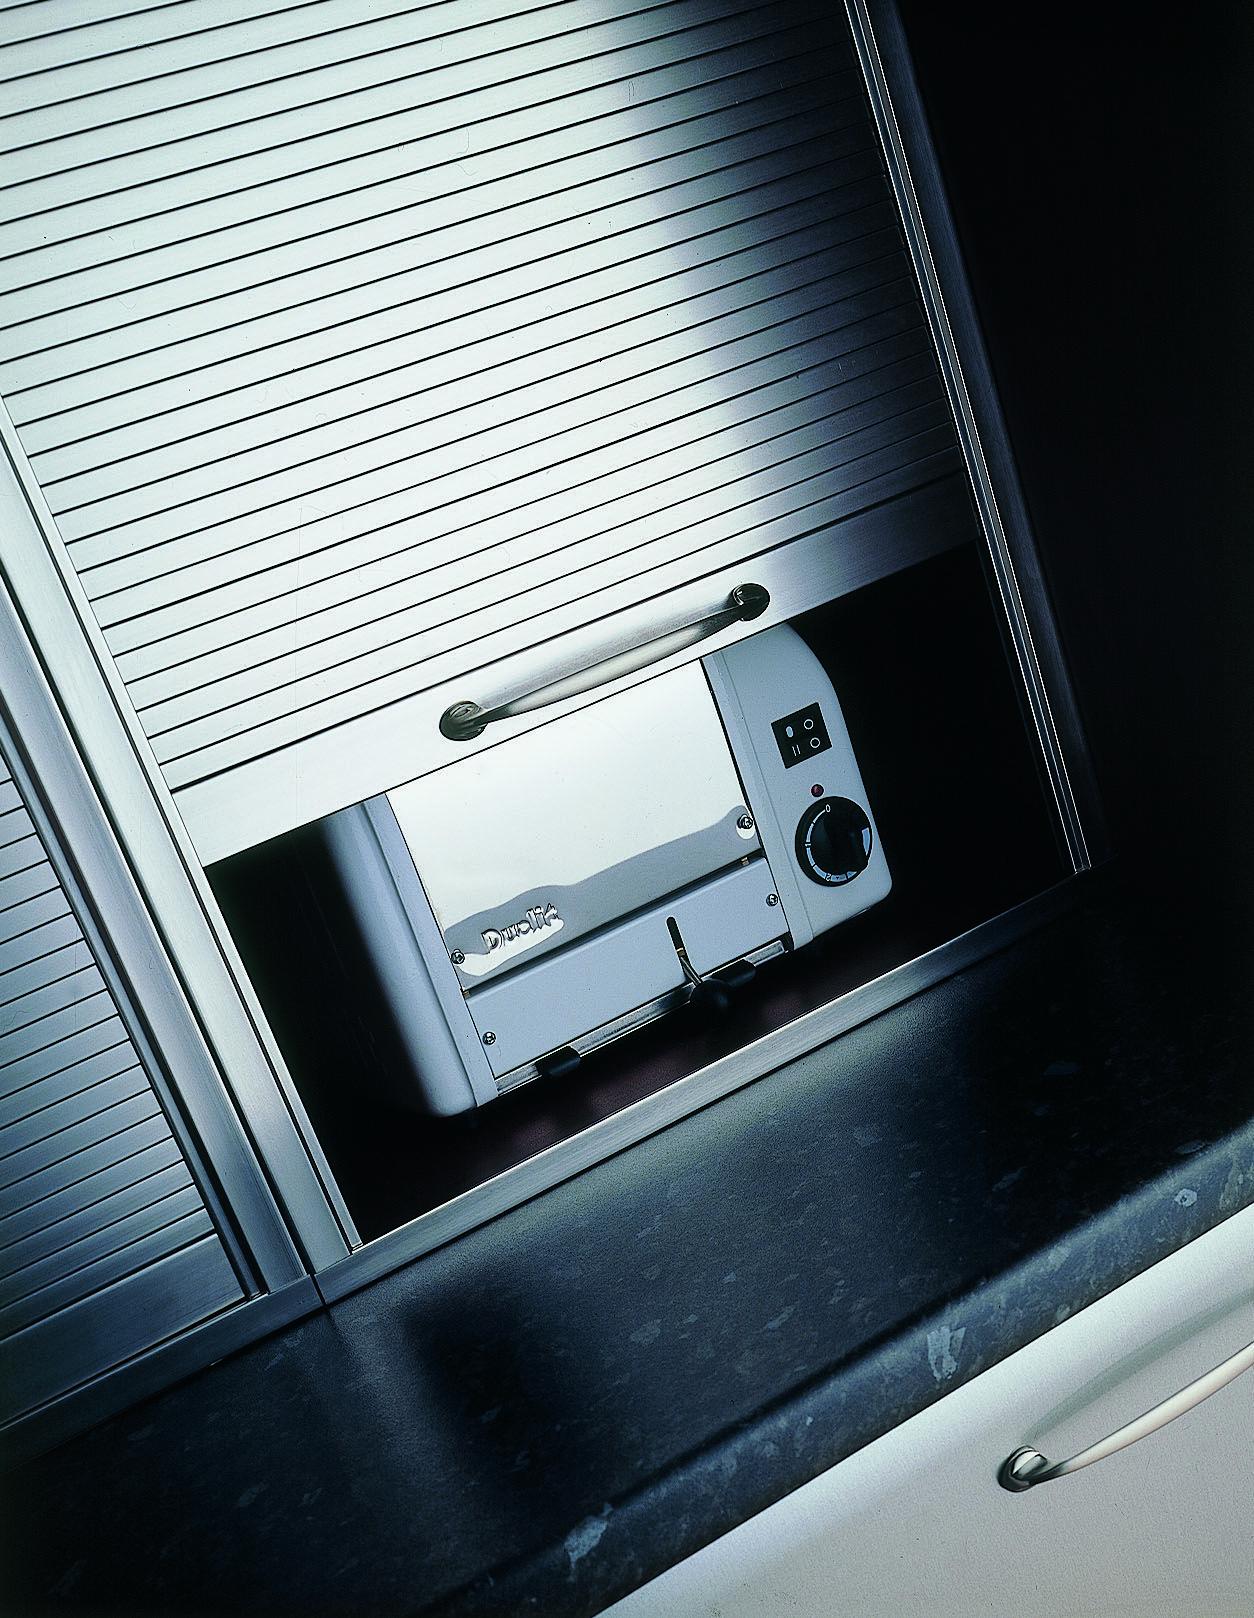 kitchen appliance garage kits high top sets tambour door | msd pinterest tambour, doors and laundry